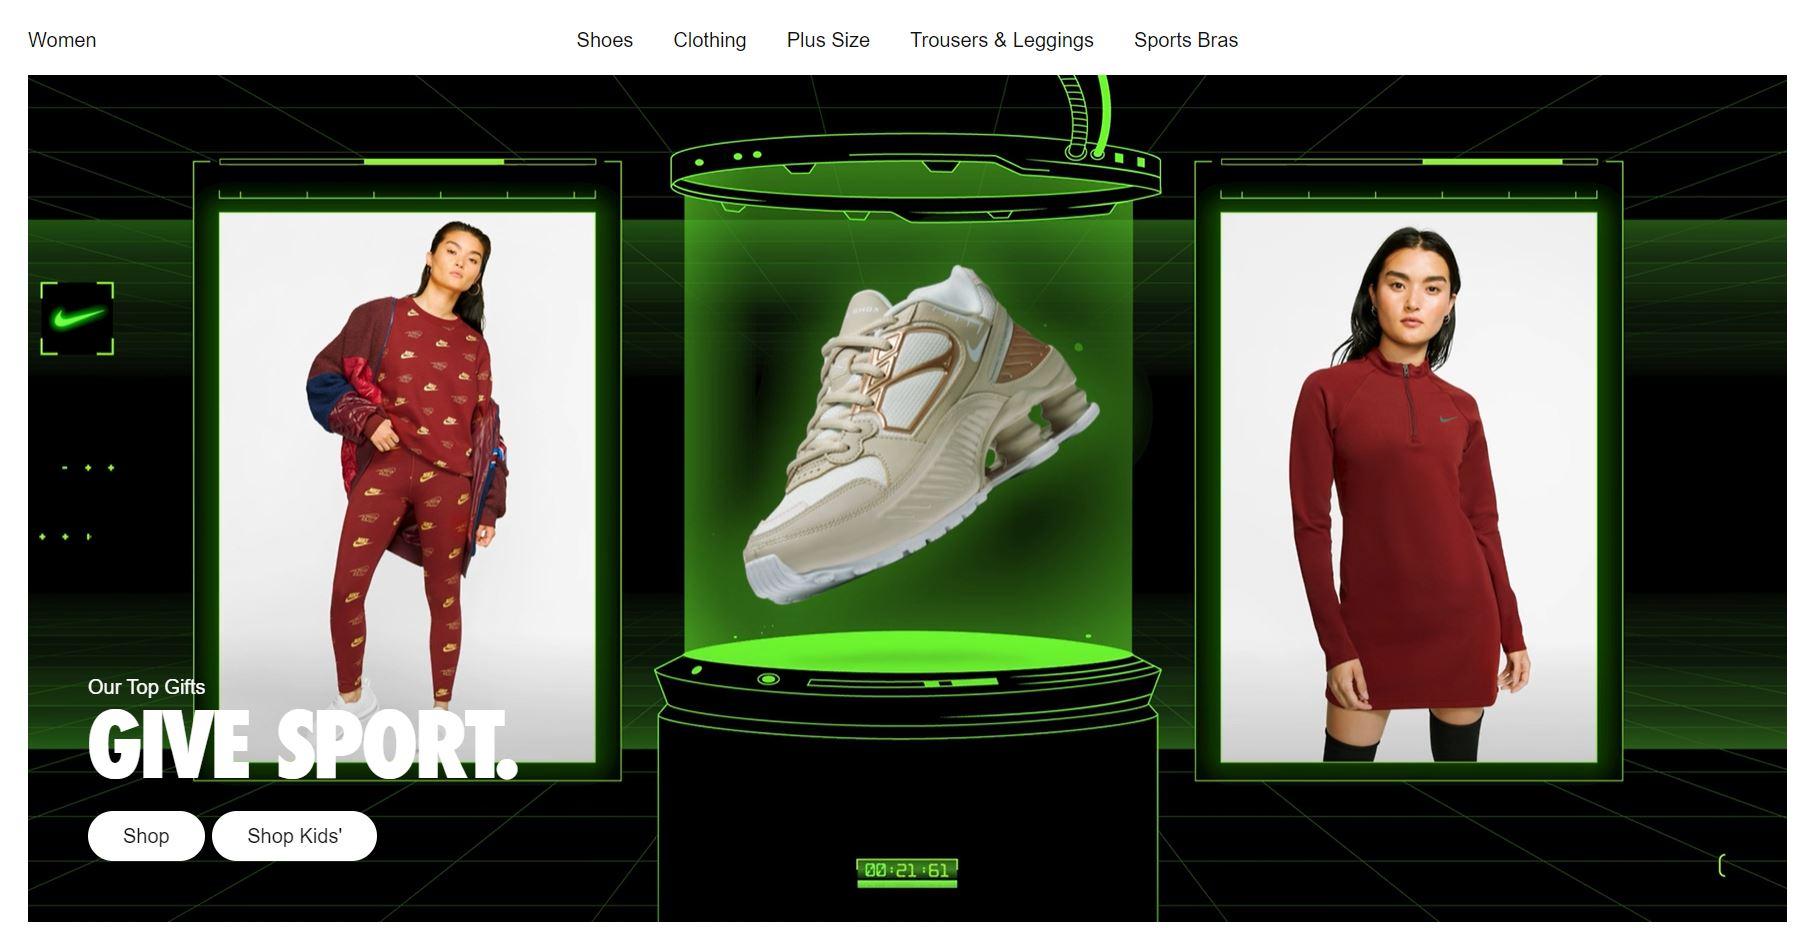 LP- Nike women